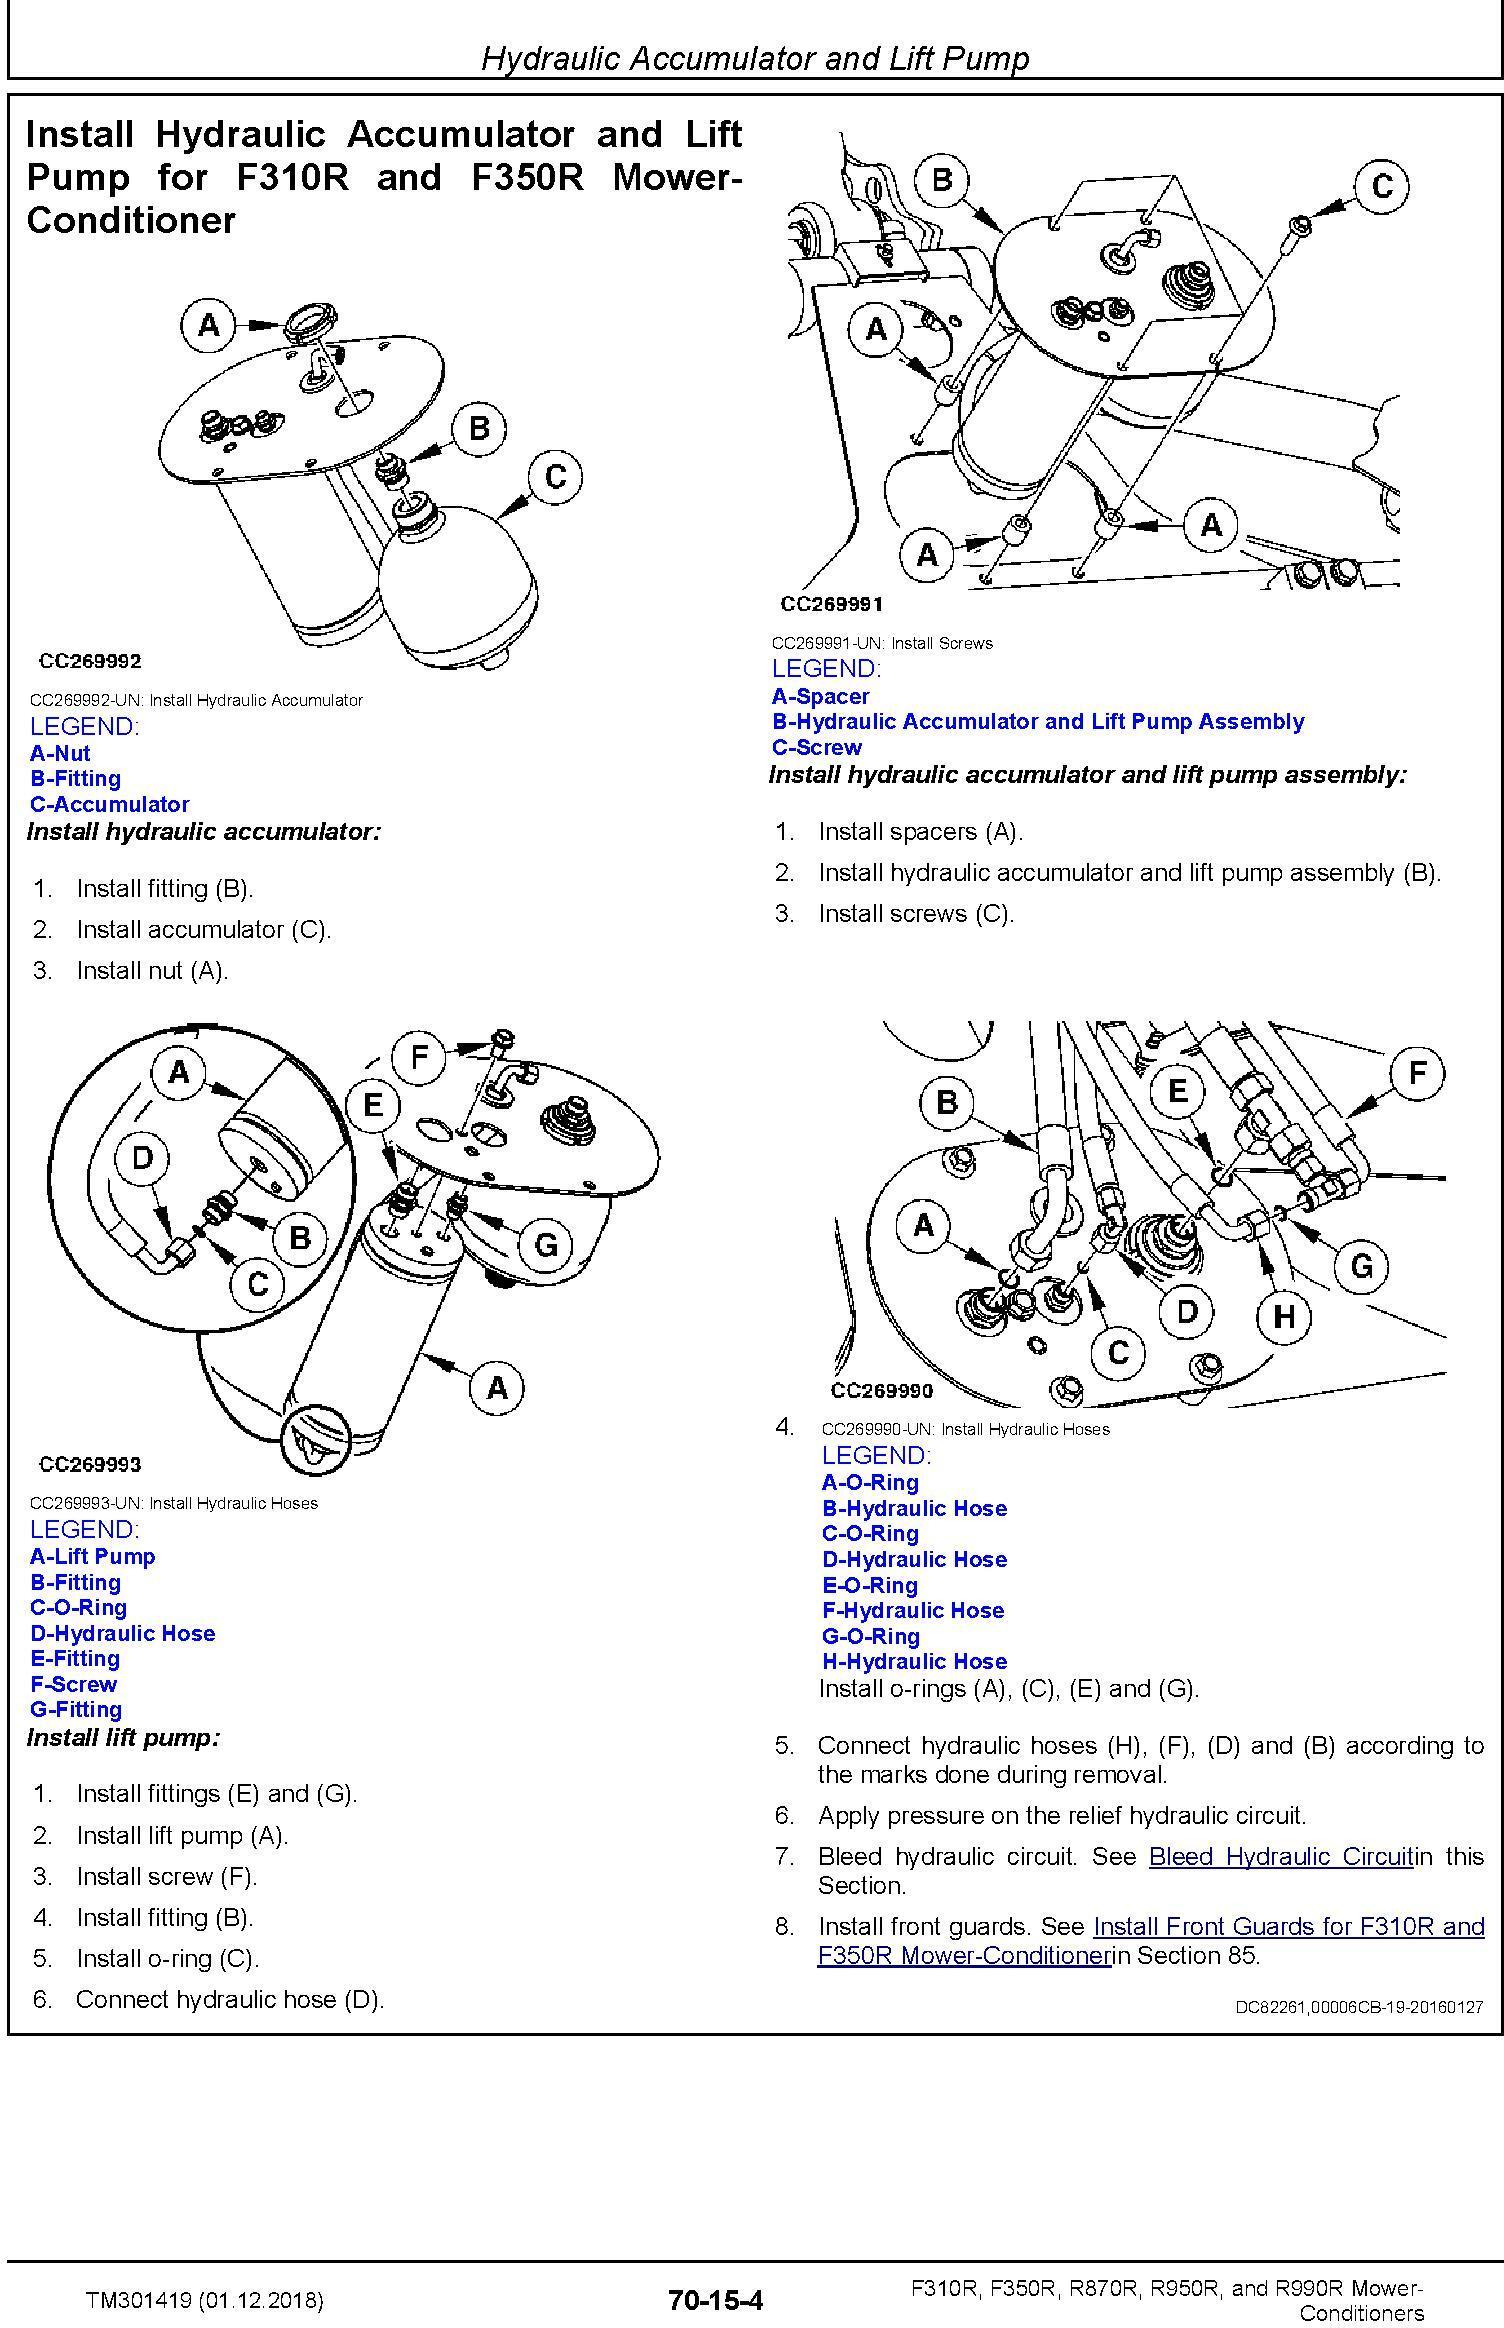 John Deere F310R, F350R, R870R, R950R and R990R Mower-Conditioners Technical Manual (TM301419) - 2